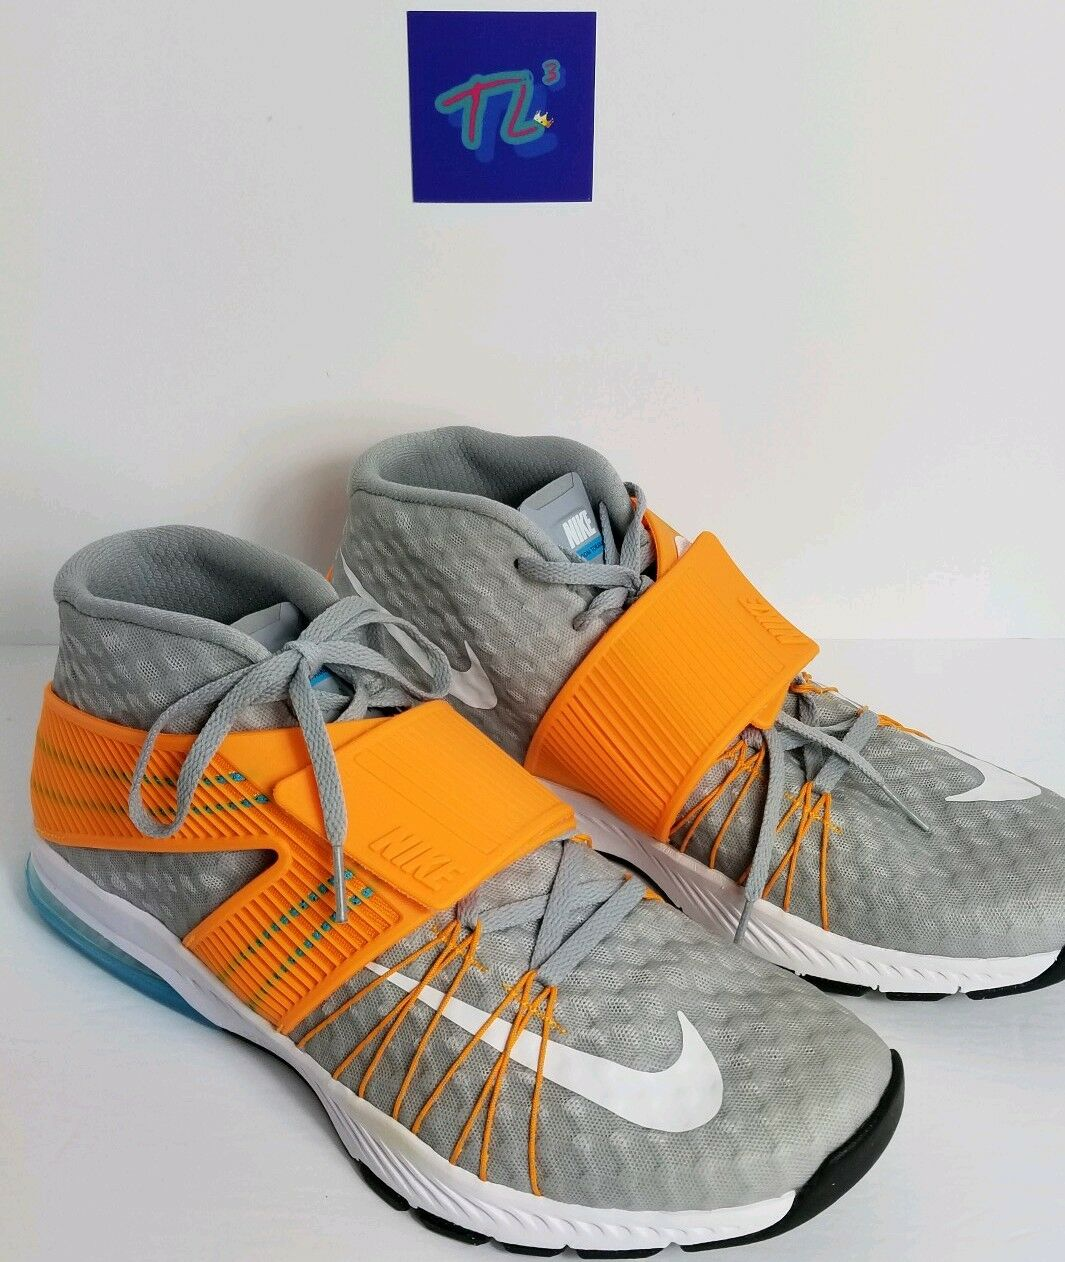 Men's Nike Zoom Train Toranada 835657-018 Sz 10 Wolf Grey orange Light blueee